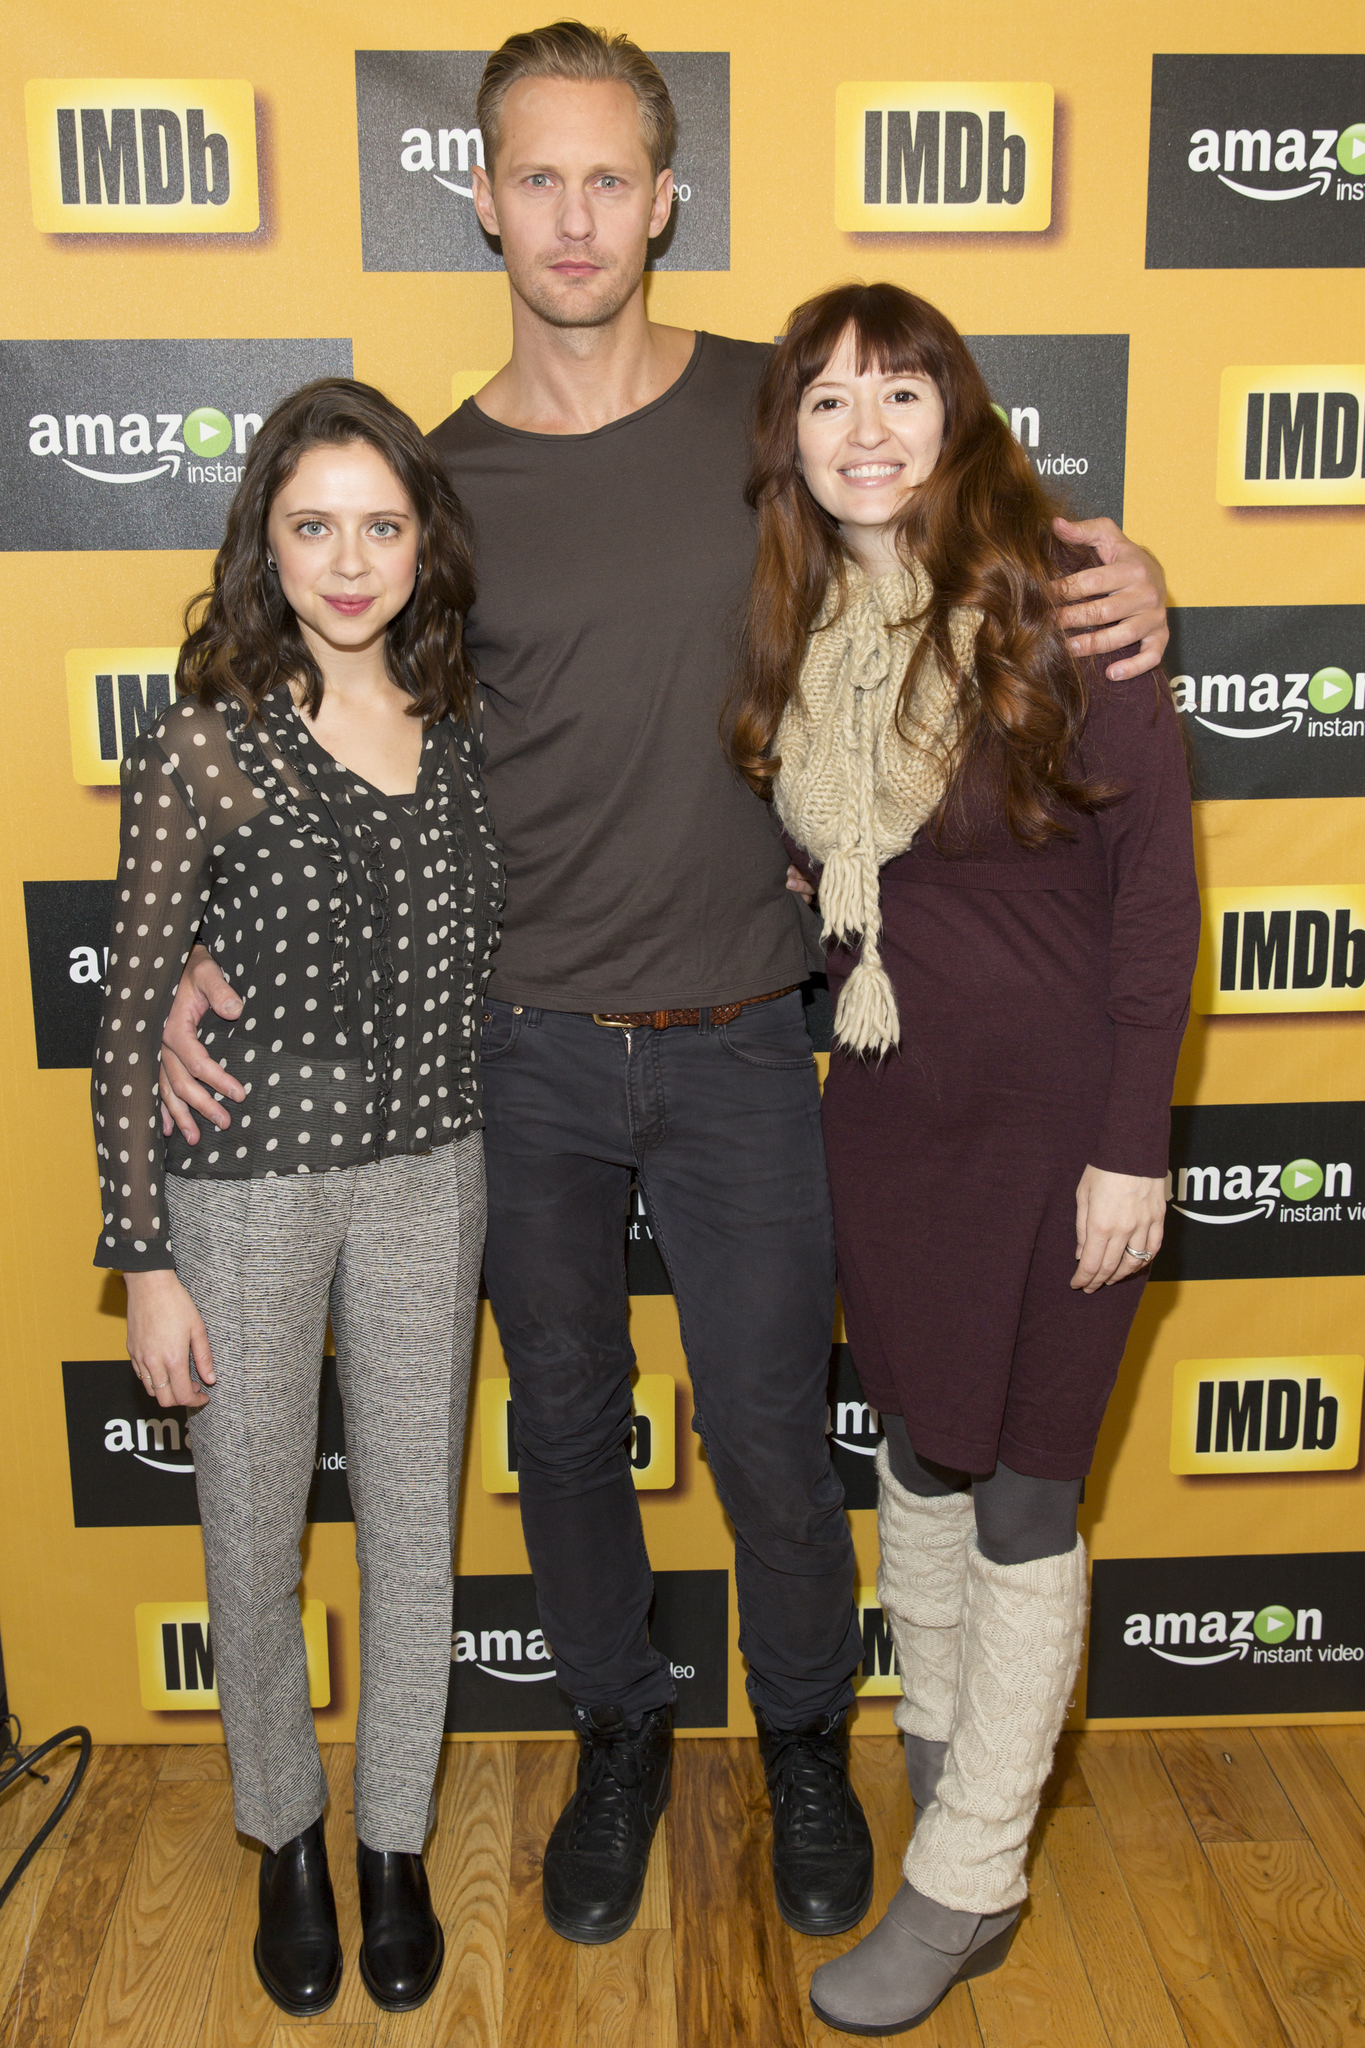 Alexander Skarsgård, Marielle Heller, and Bel Powley at an event for The IMDb Studio at Sundance (2015)